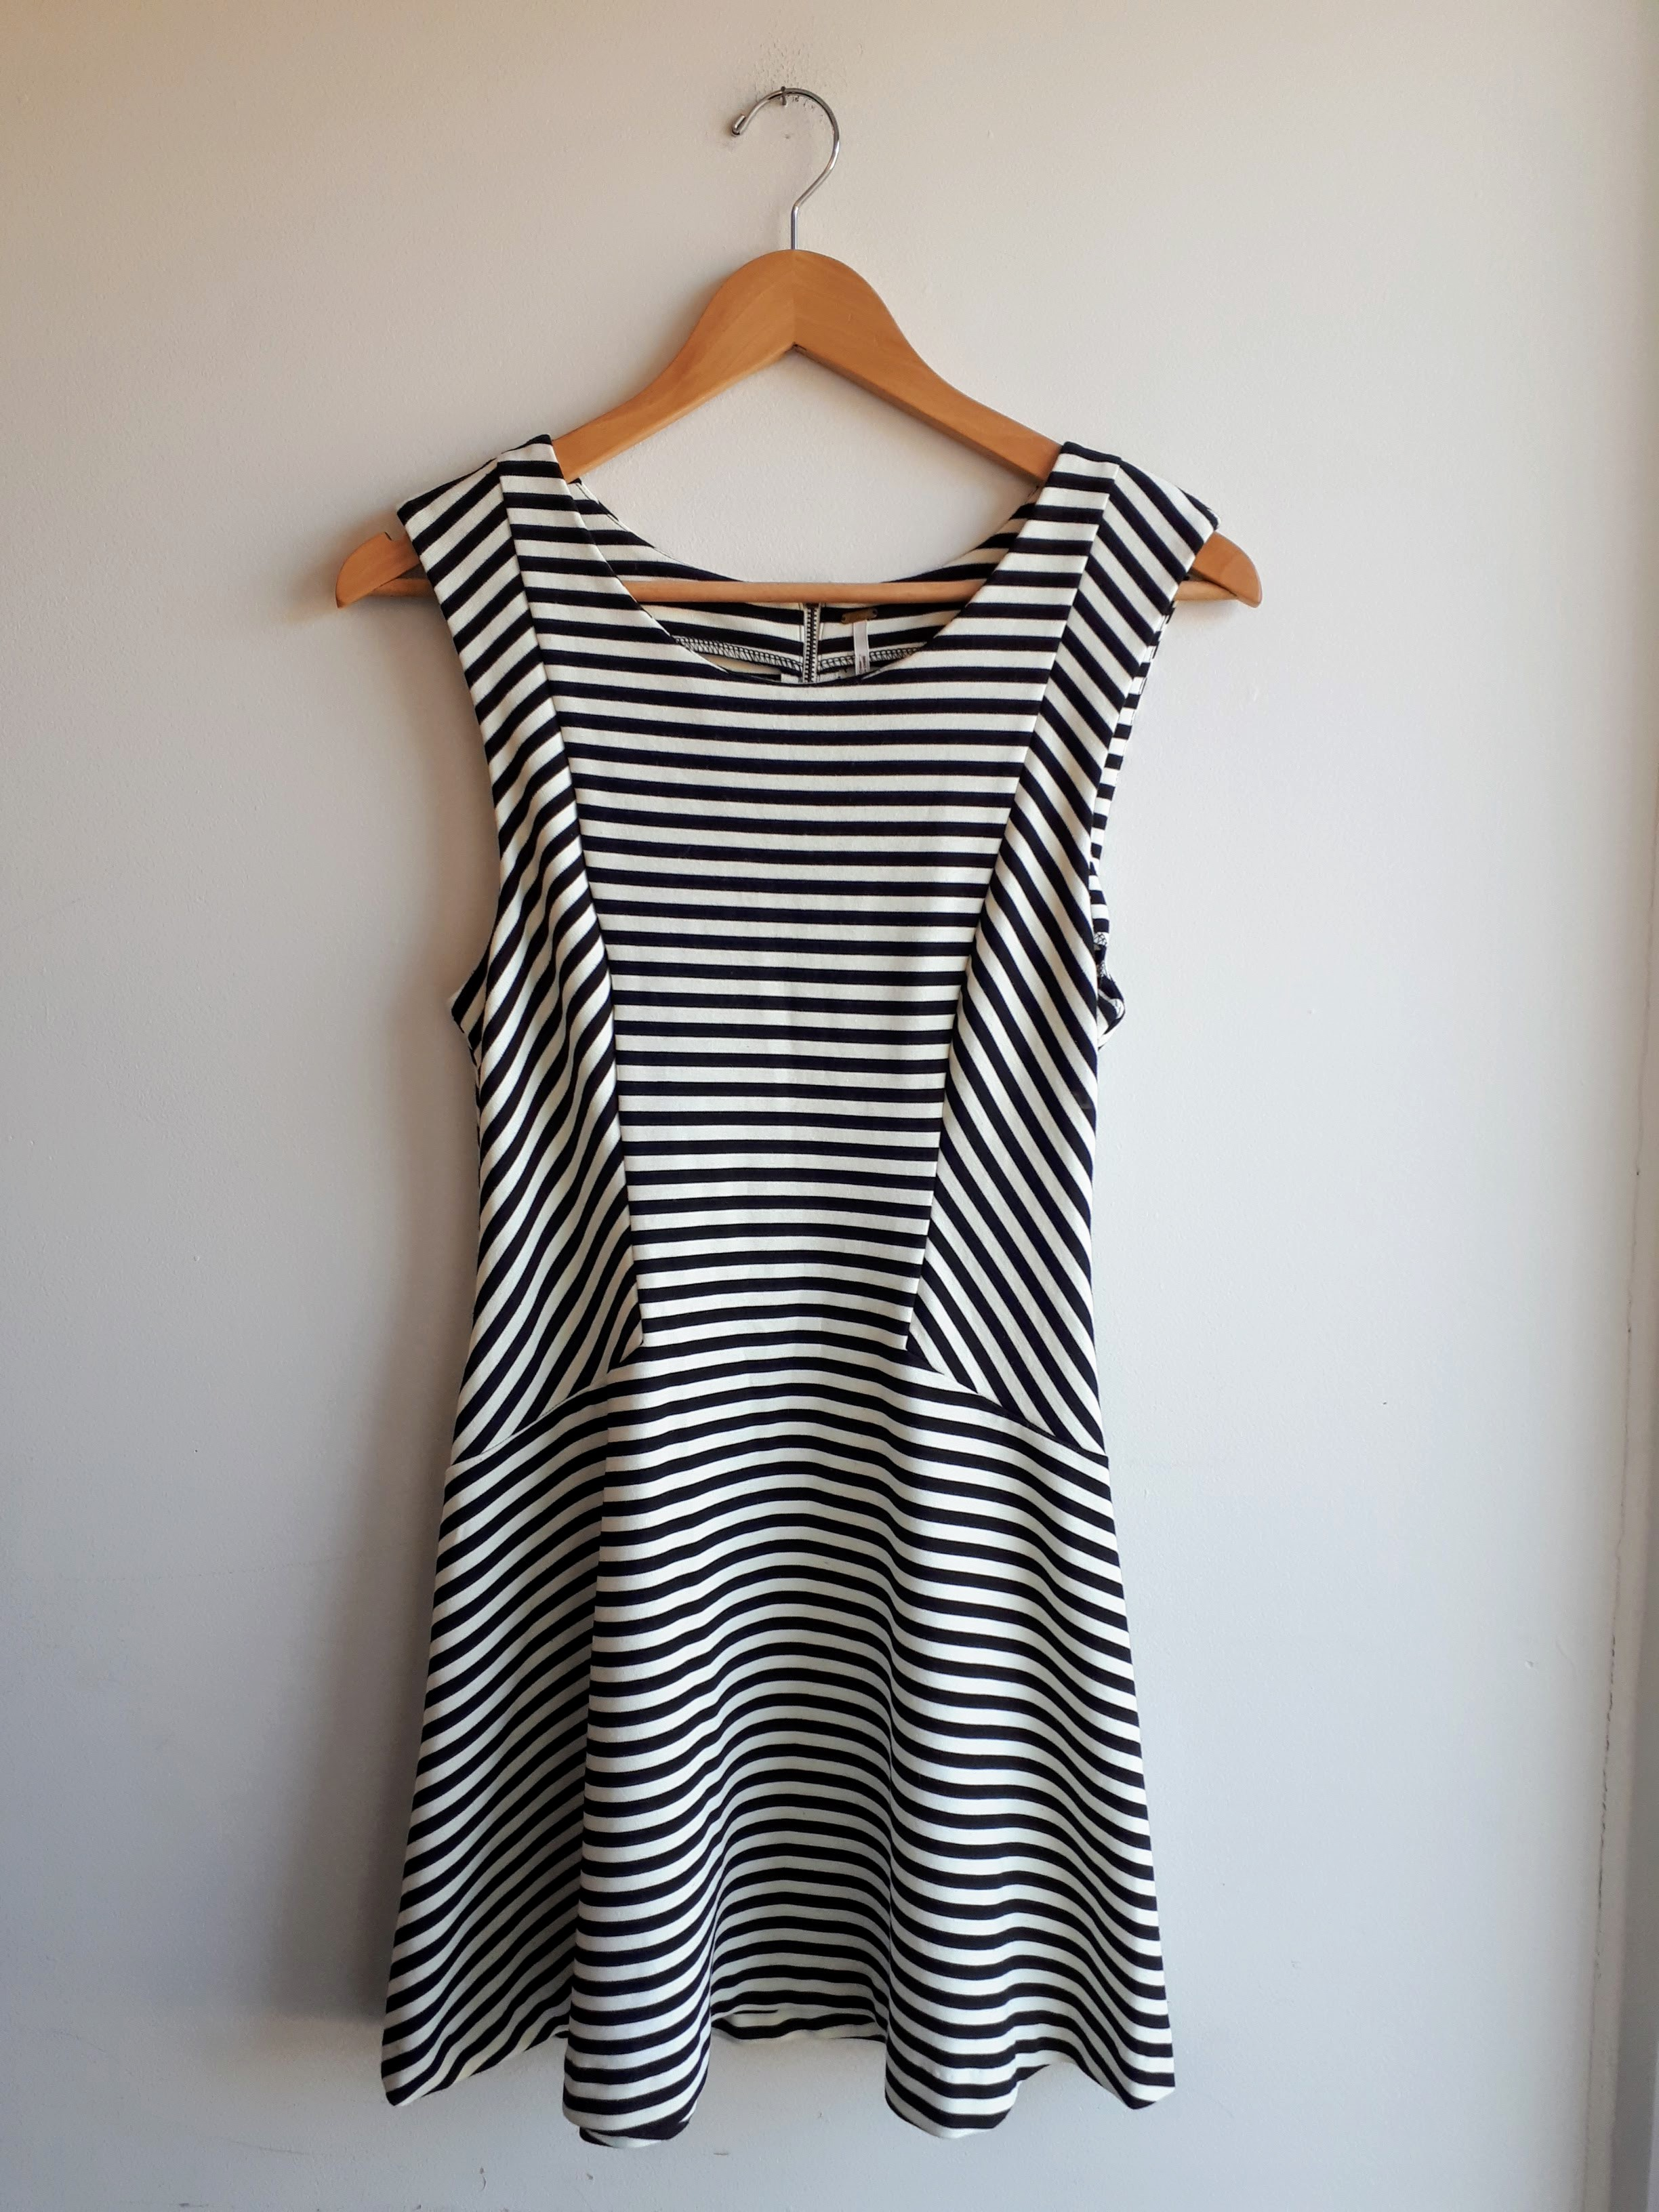 Free People dress; Size M, $34